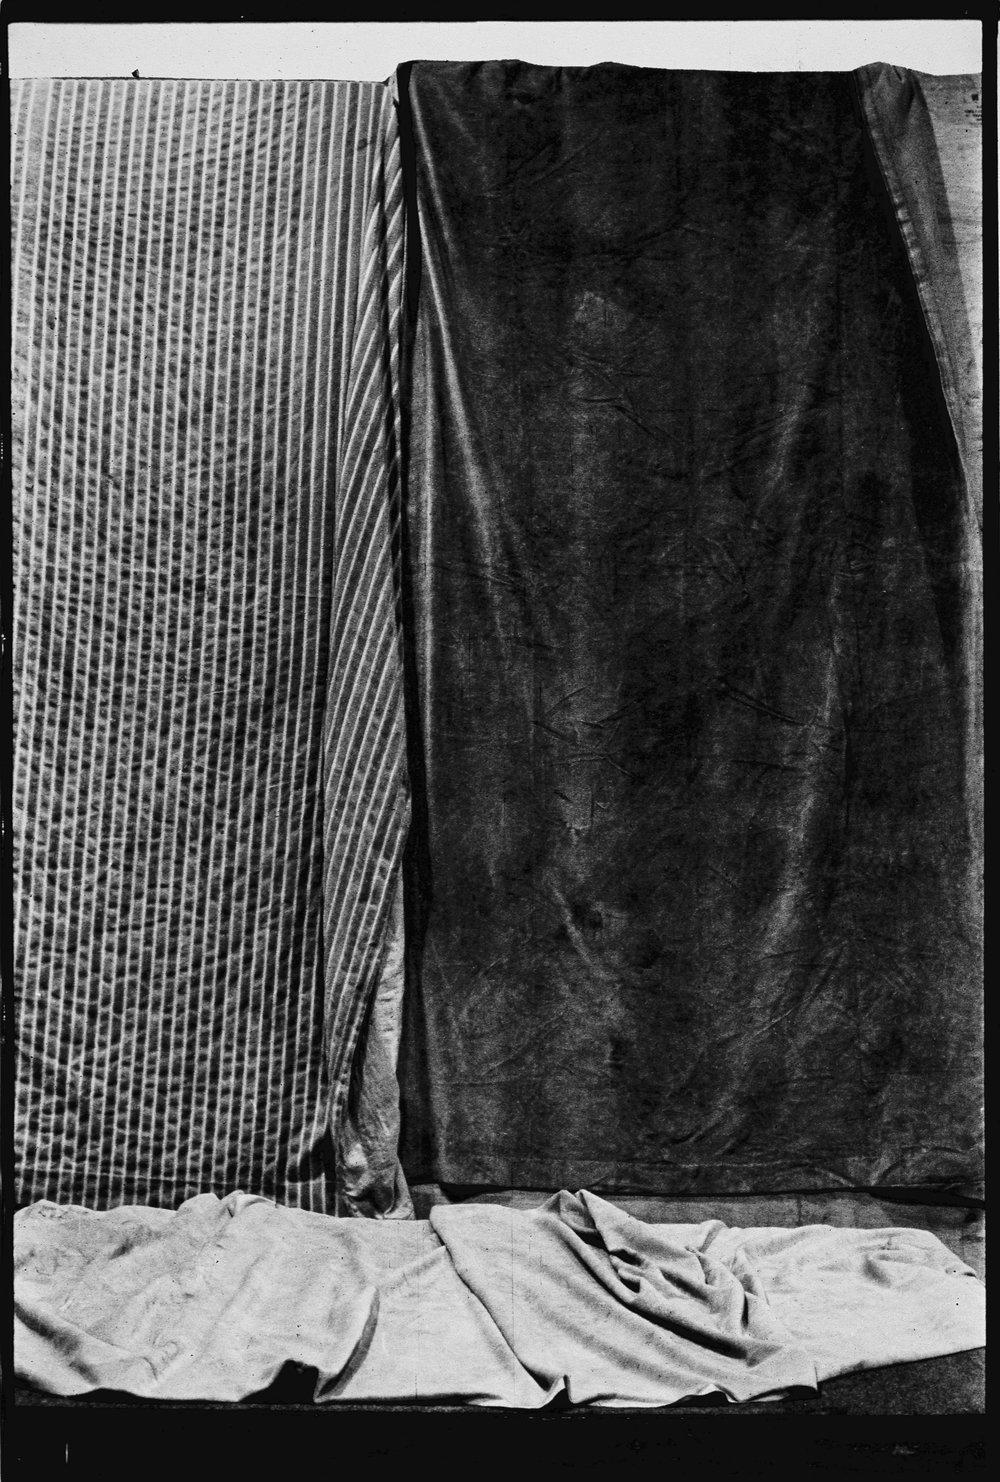 Absent Nude III . Rijksakademie, Amsterdam. 1981